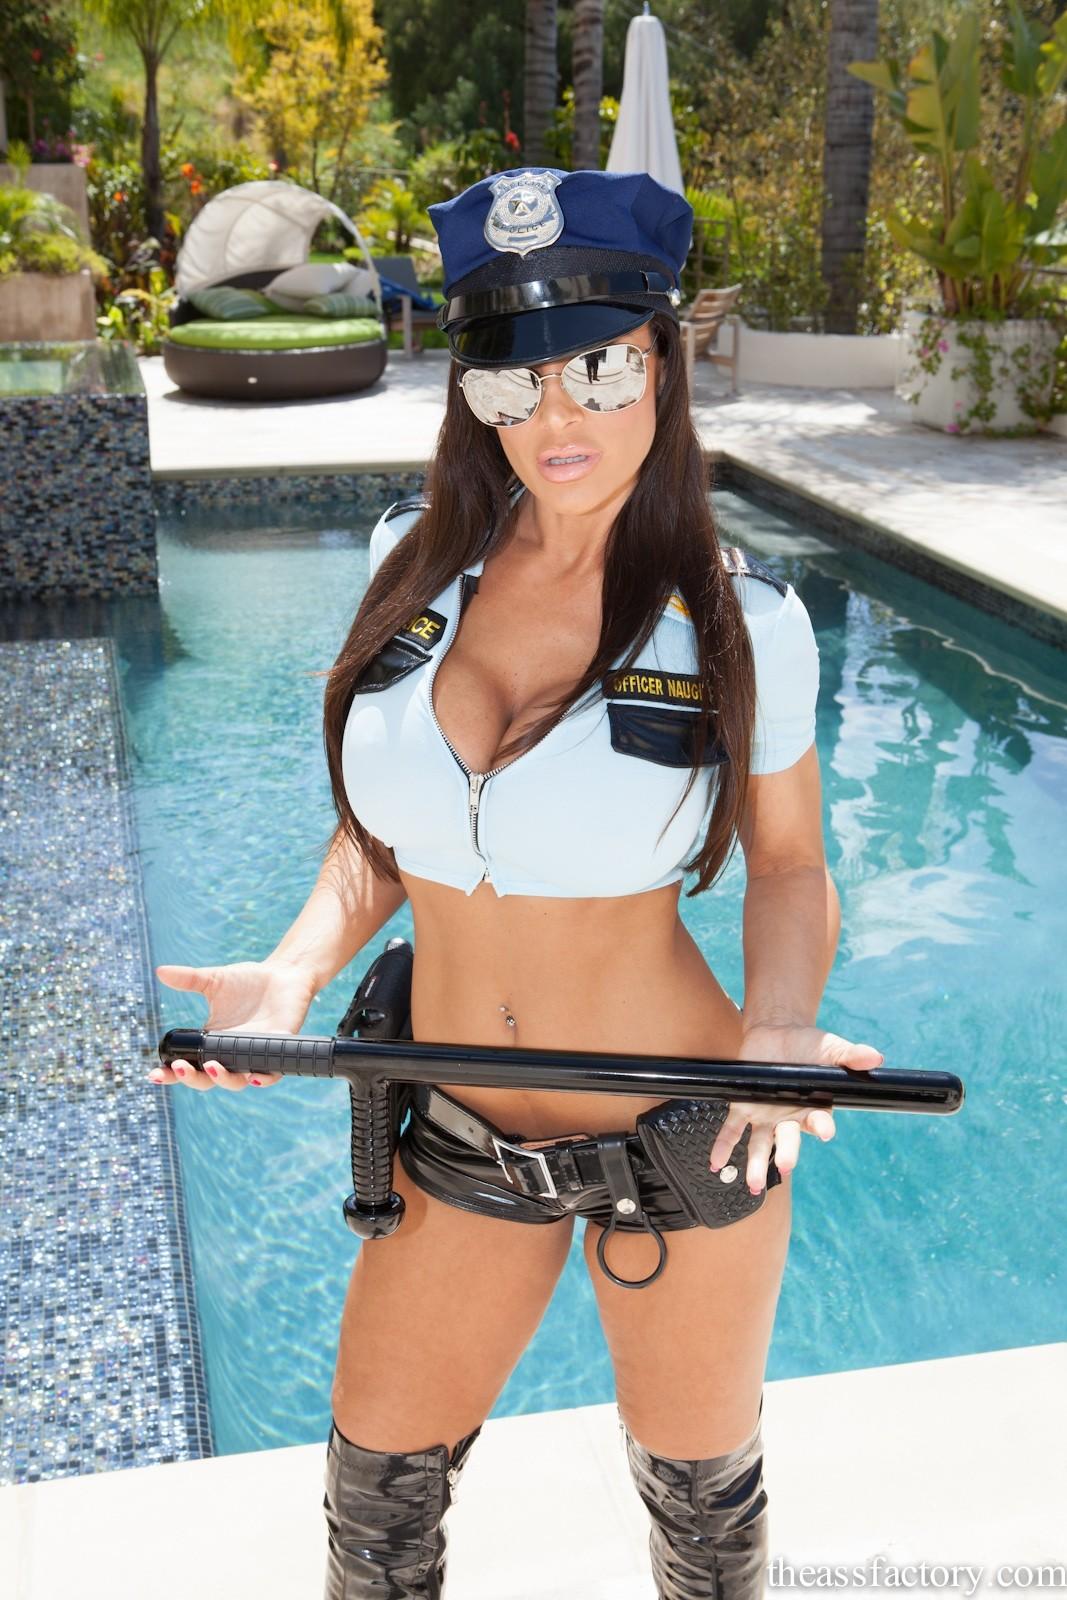 Actrices Porno Vestidas De Policia lisa ann vestida de policía - poringa!